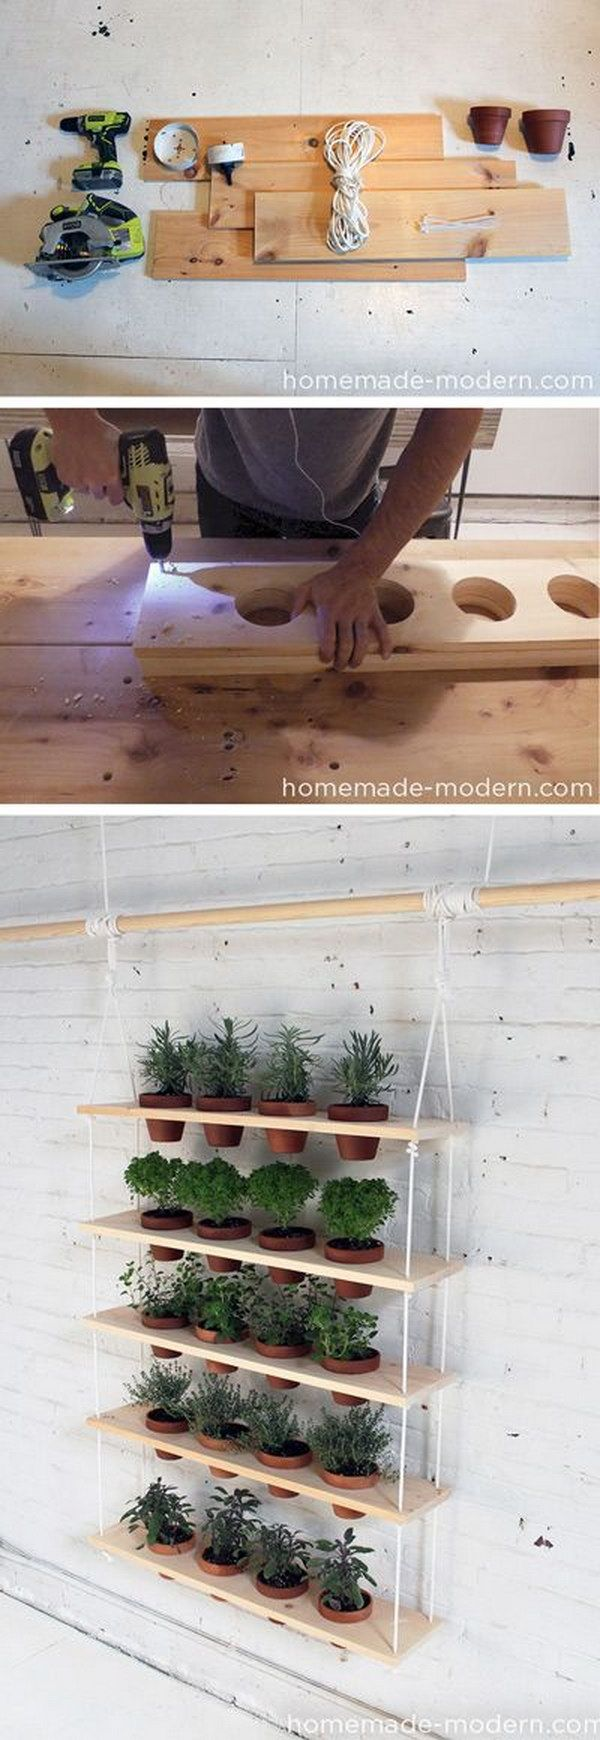 Kitchen Herbs Garden 25 Best Window Herb Gardens Trending Ideas On Pinterest Growing